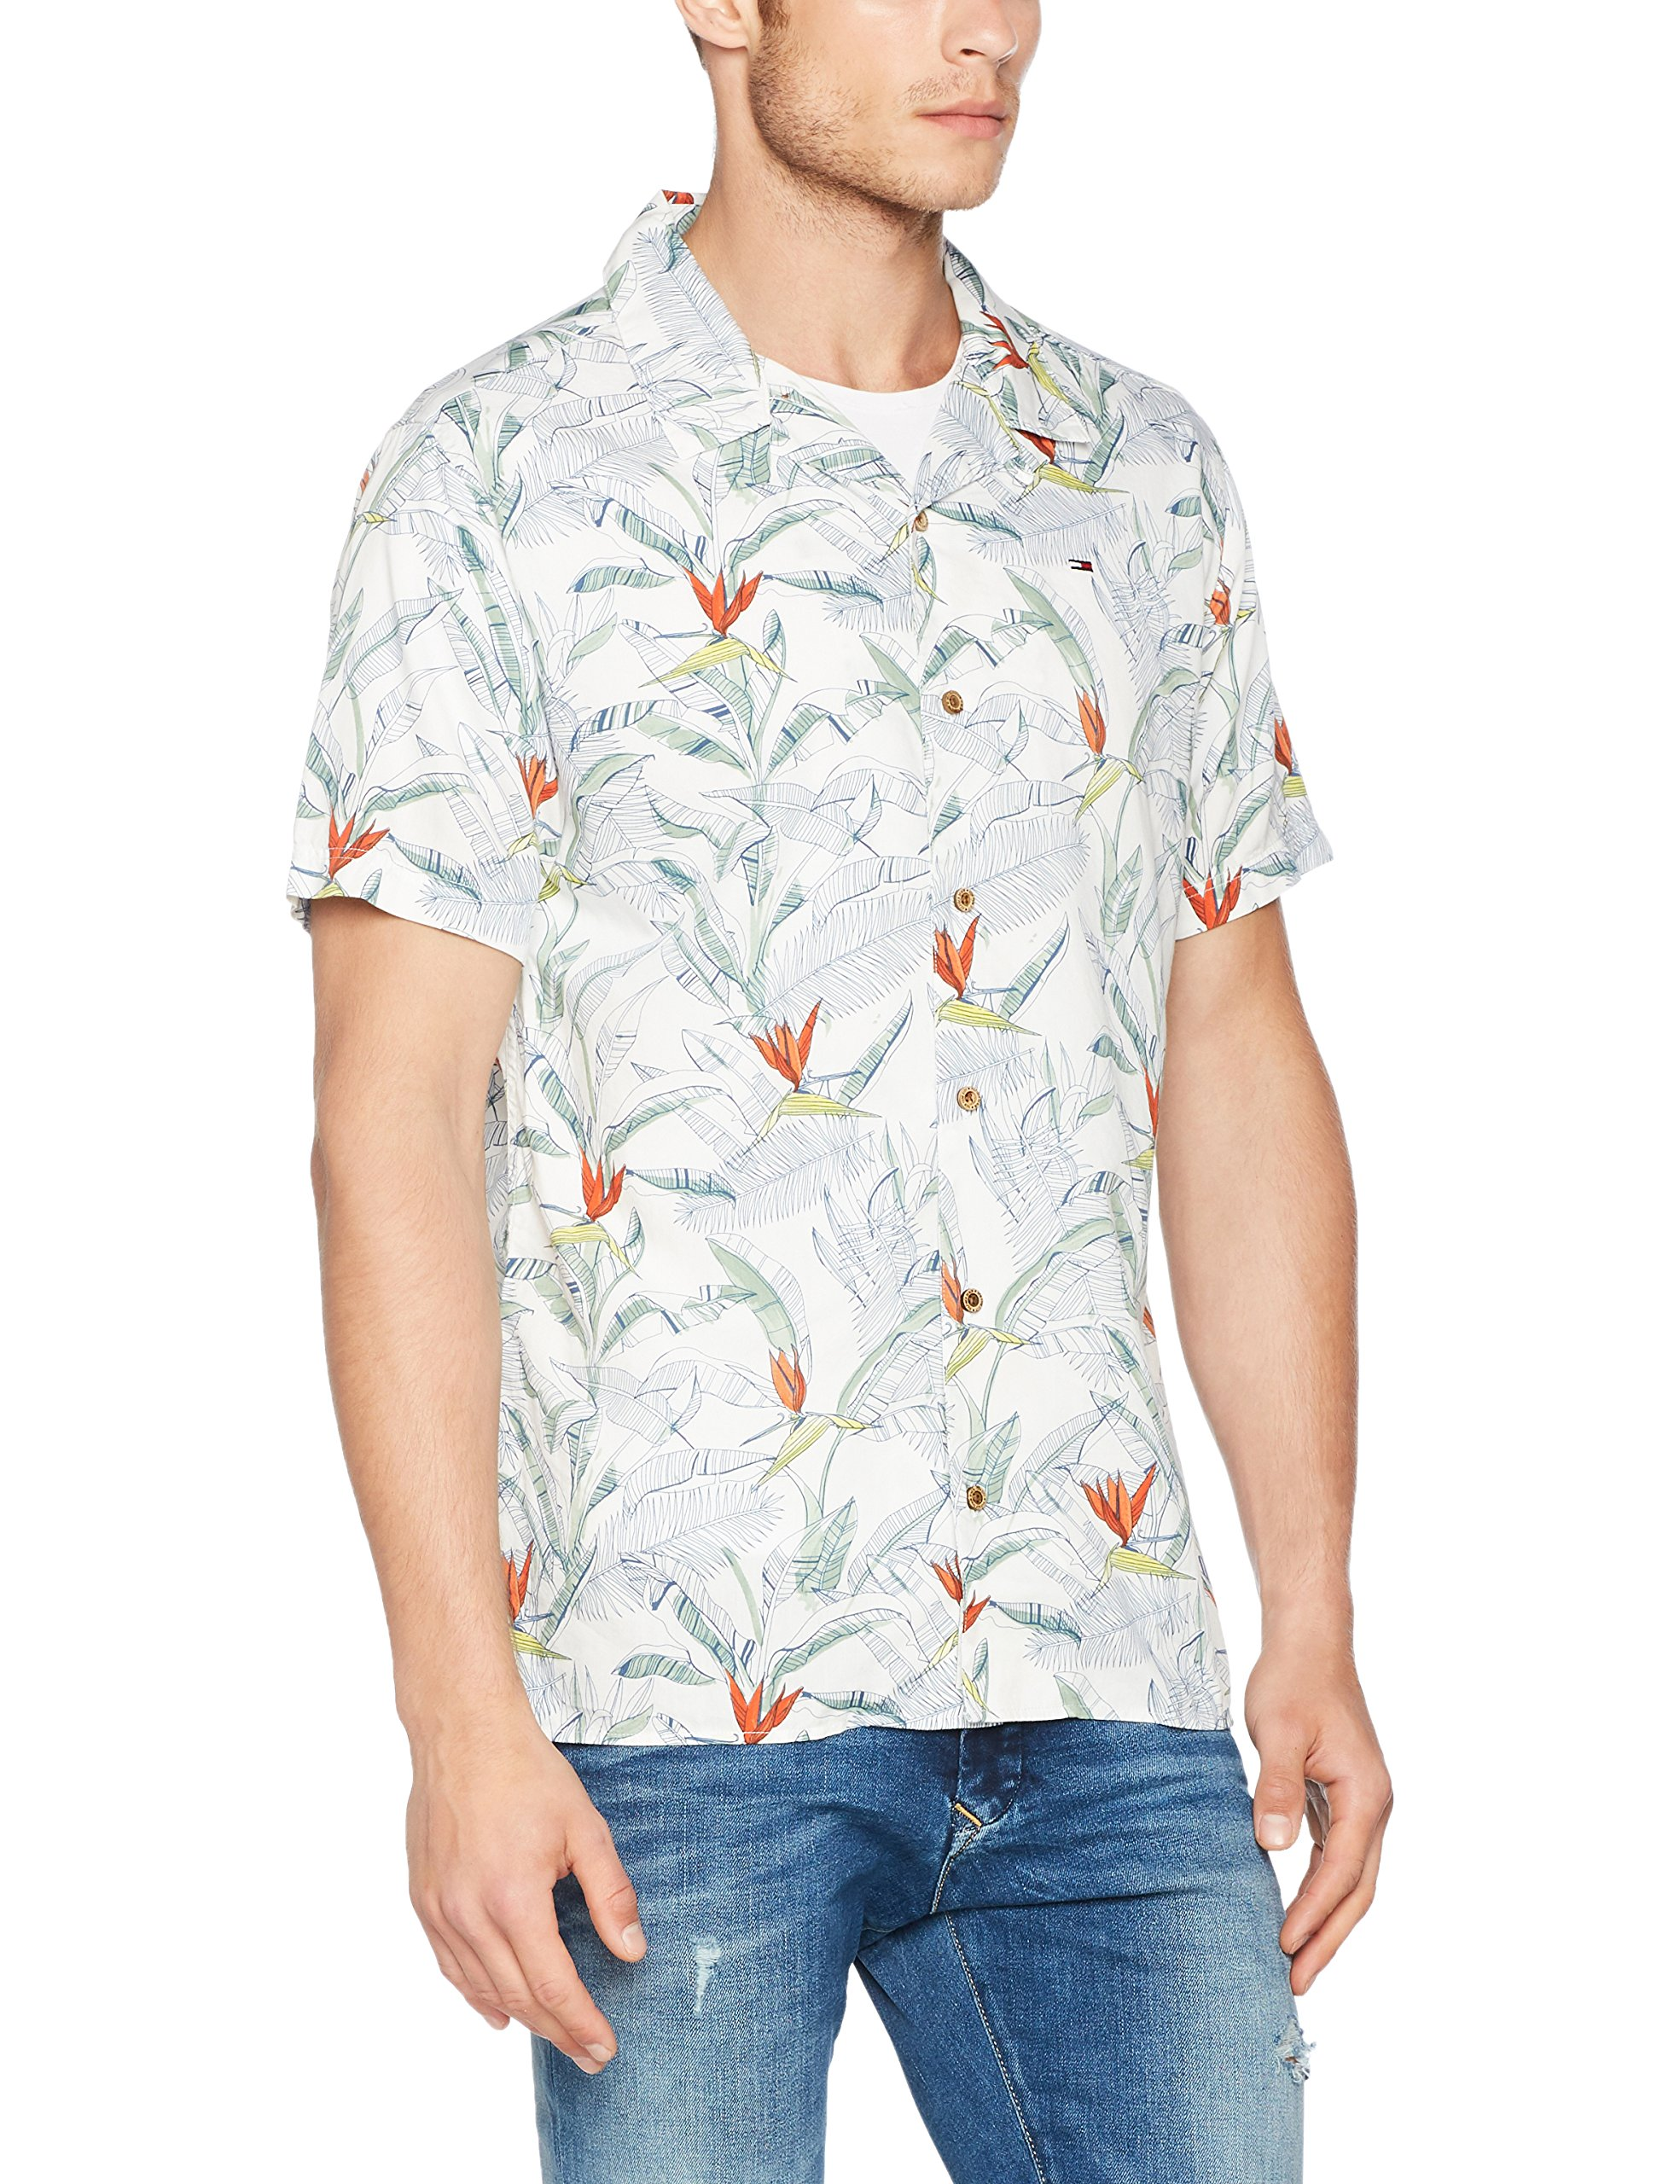 Manches Print Floral Chemise Tommy Coupe Casual Courtes Droite Homme 400Medium Jeans Multicoloretropical 0ynvNOm8w